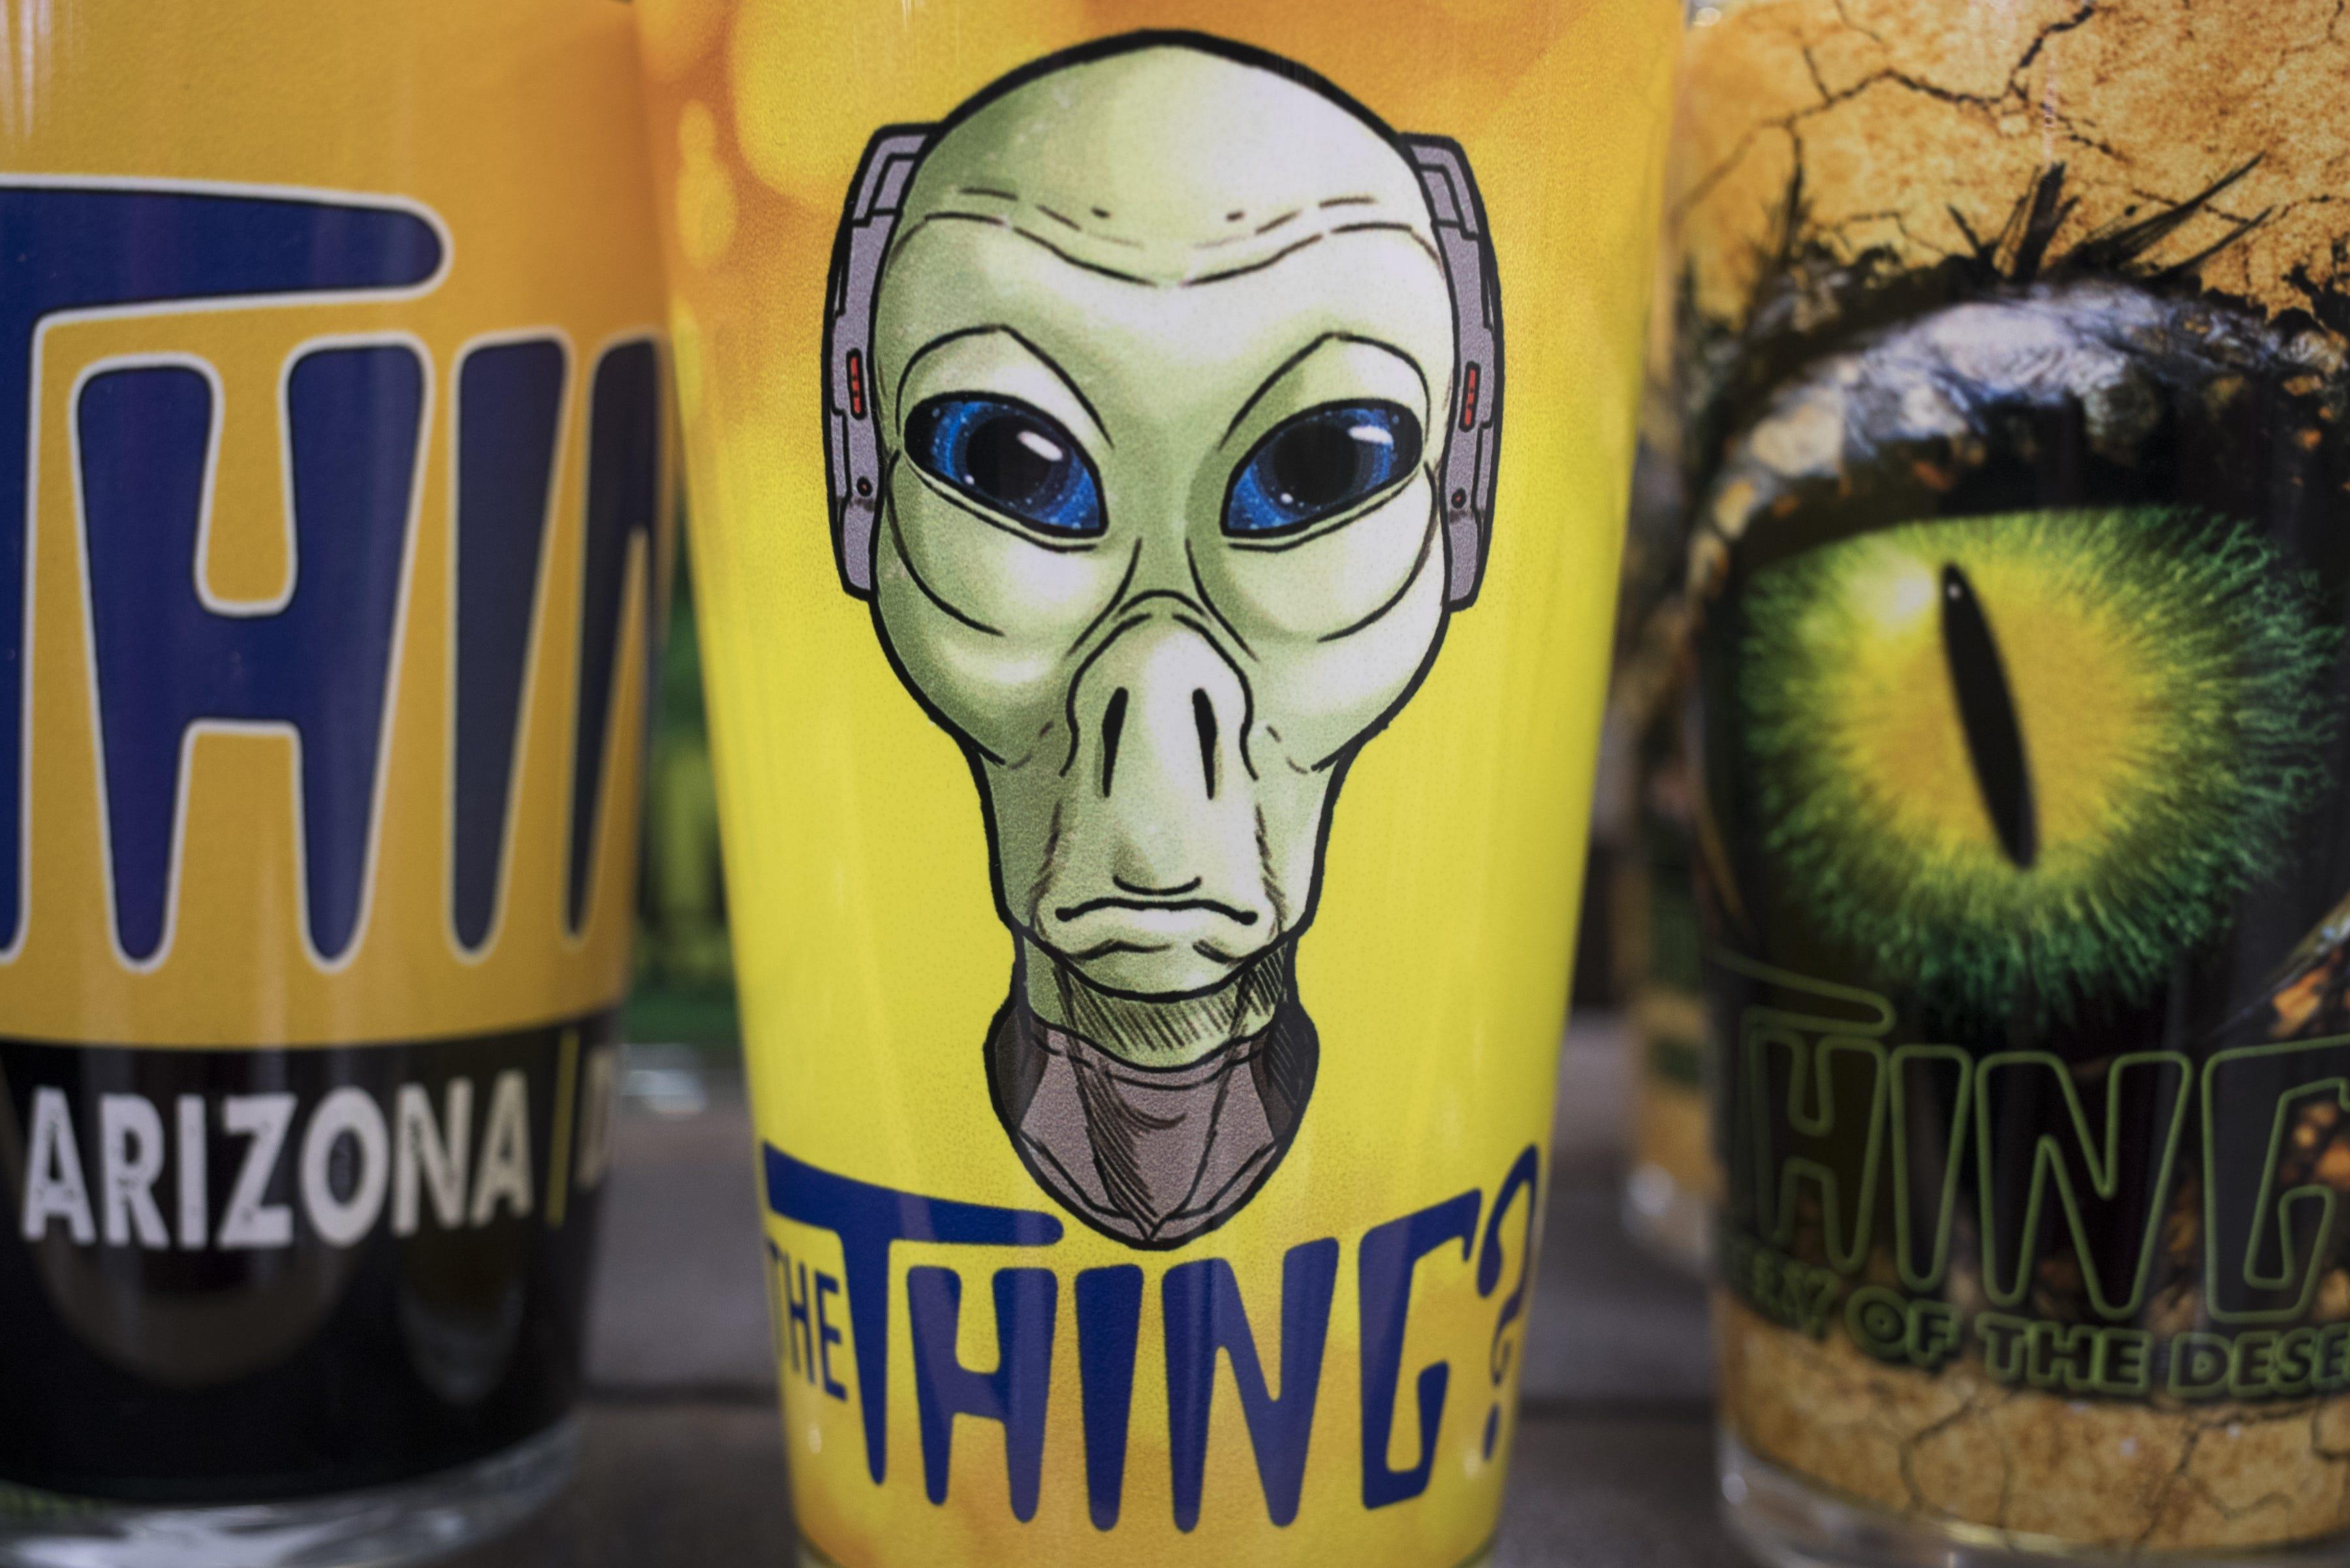 The Thing: Arizona's weirdest roadside attraction just got stranger   USA Today